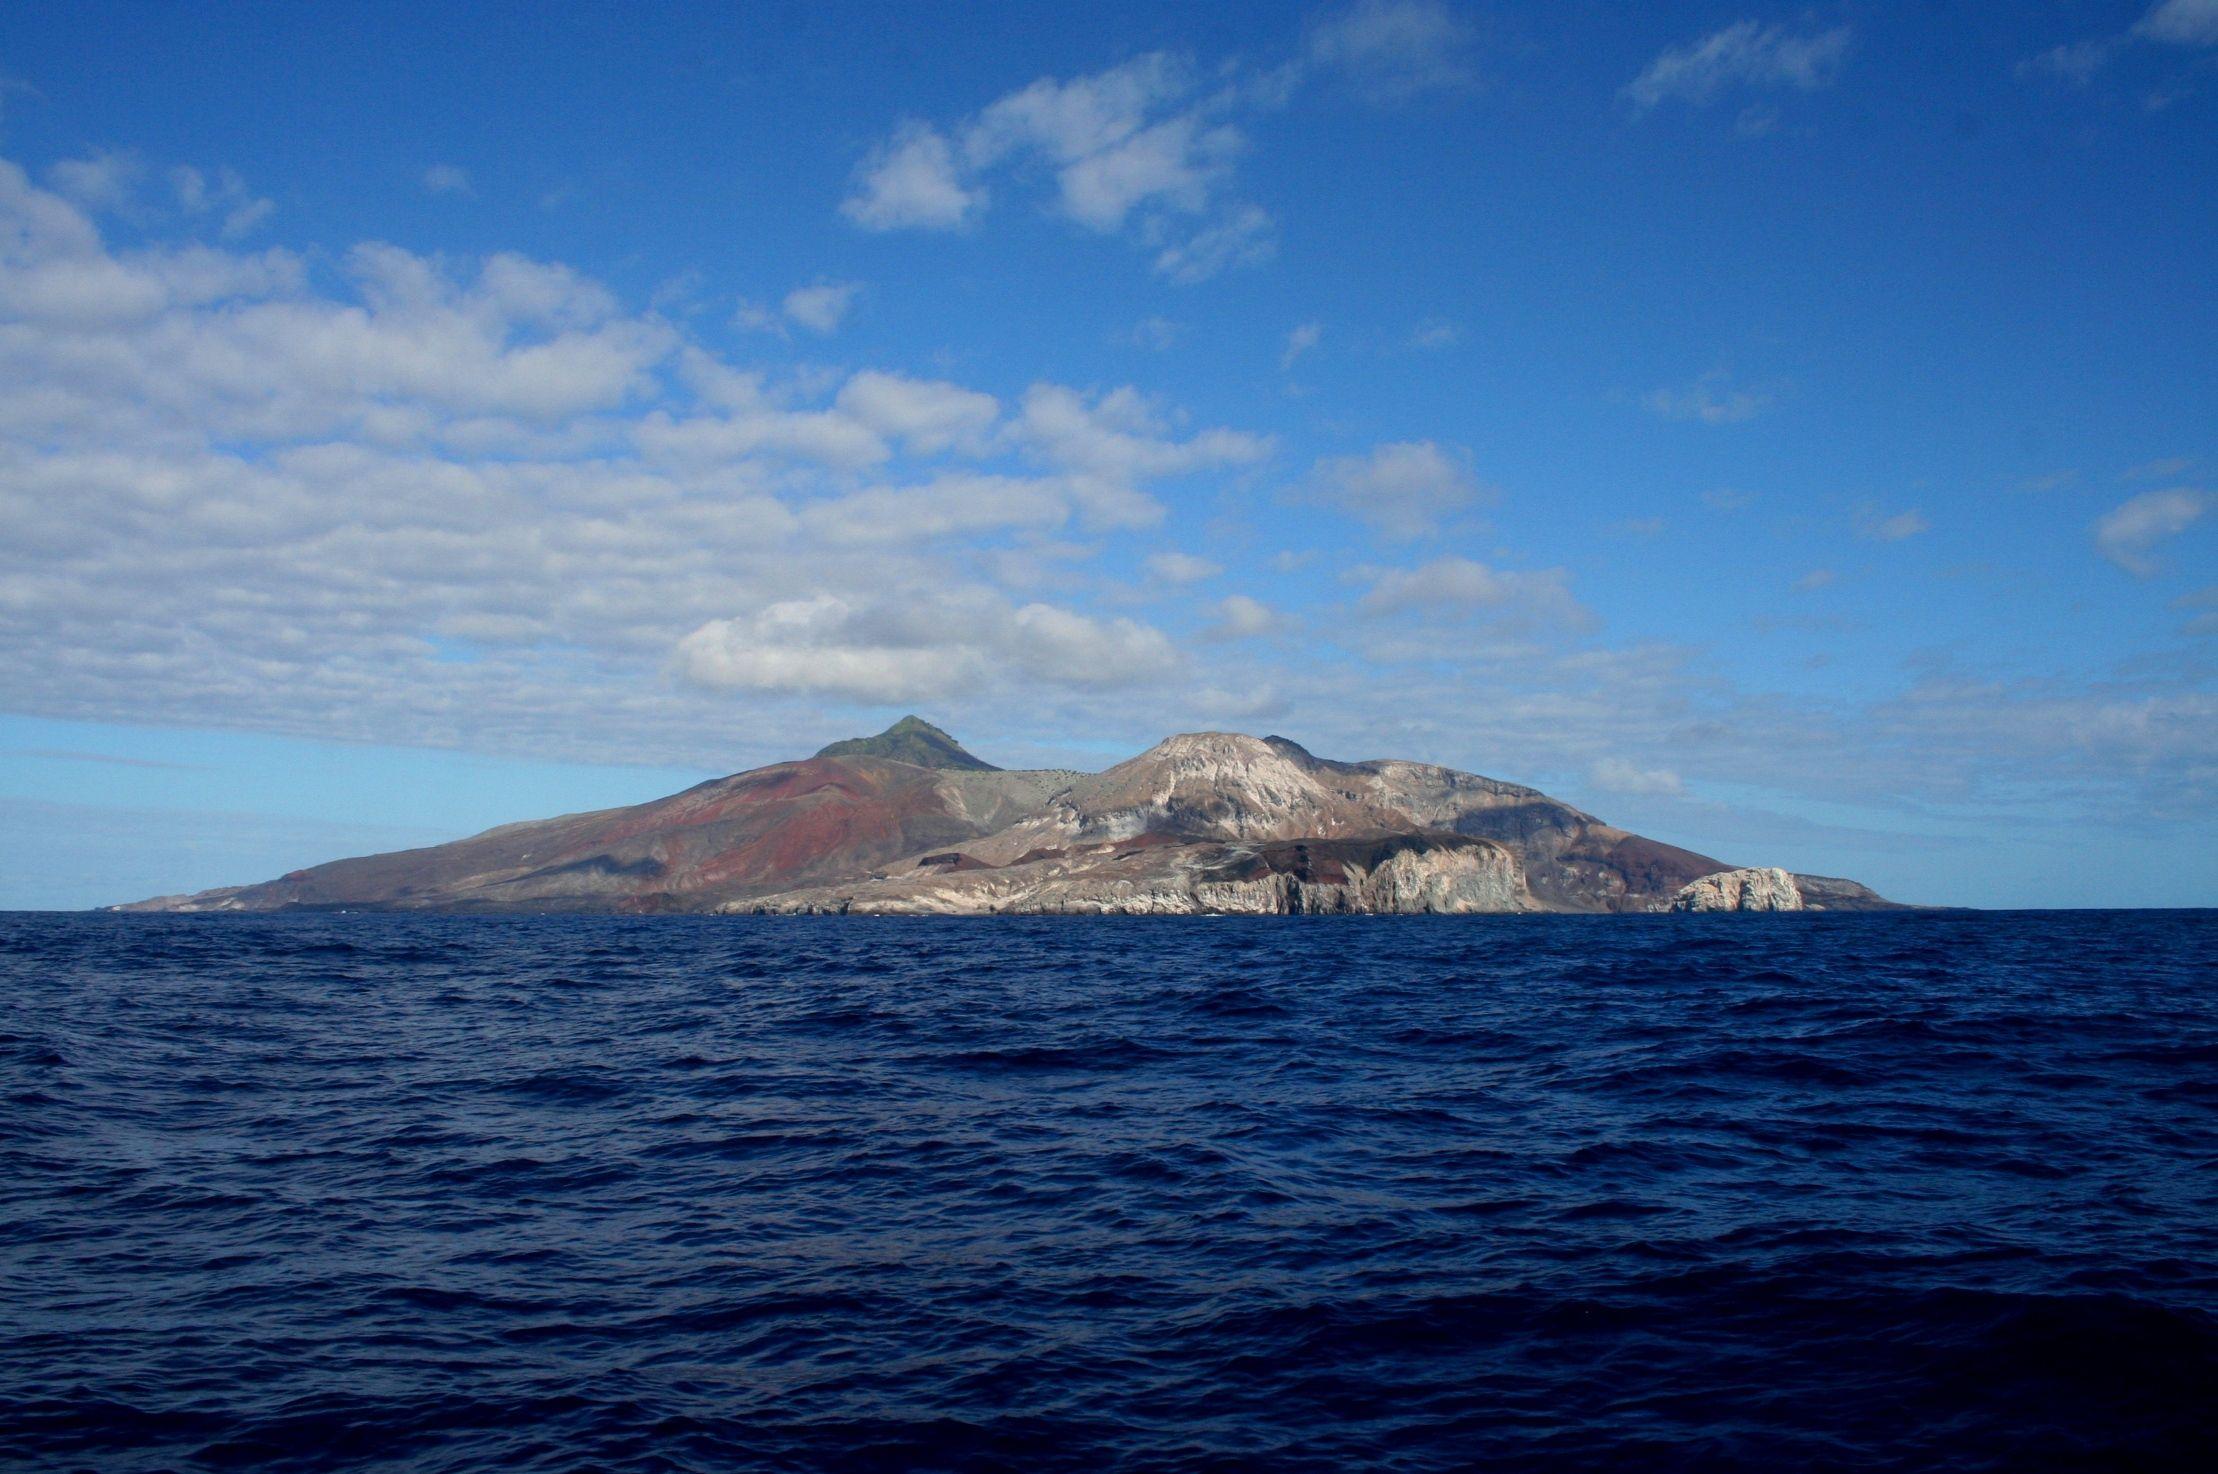 Ascension Island South Atlantic Ocean SEAS OCEANS Great Lakes - Ascension island google map